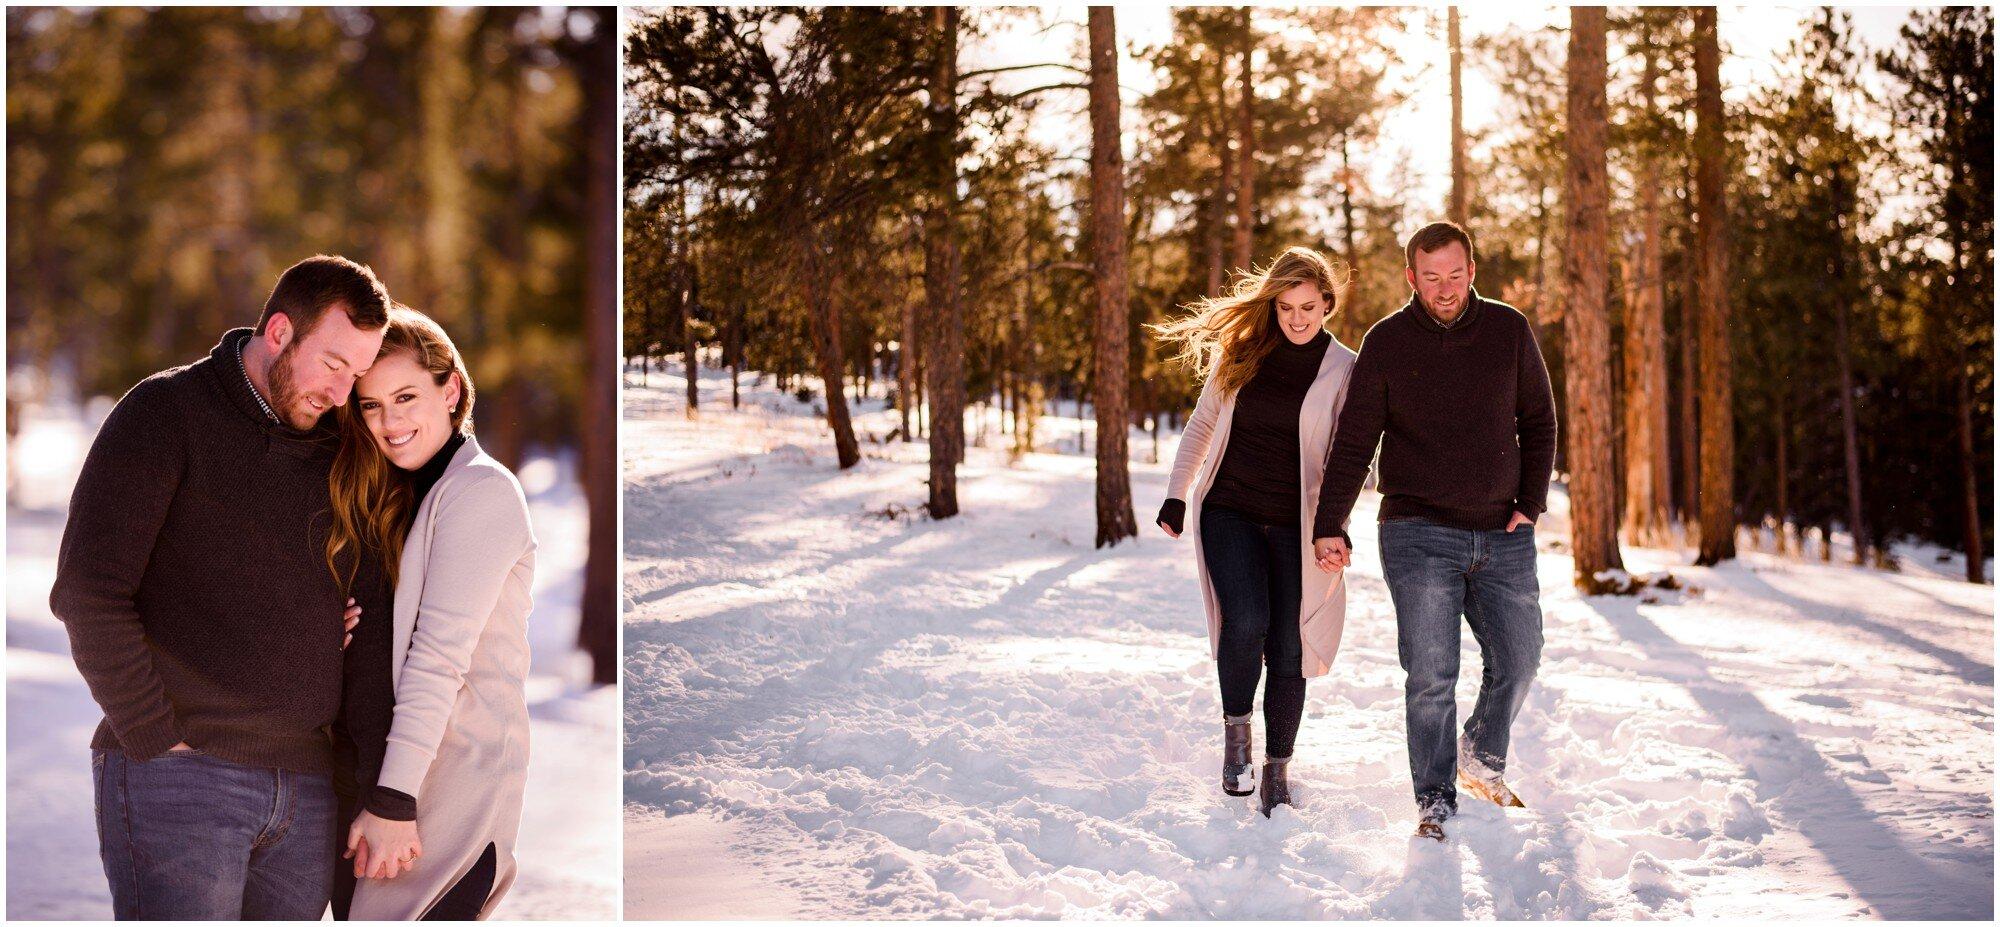 Conifer Colorado engagement photo